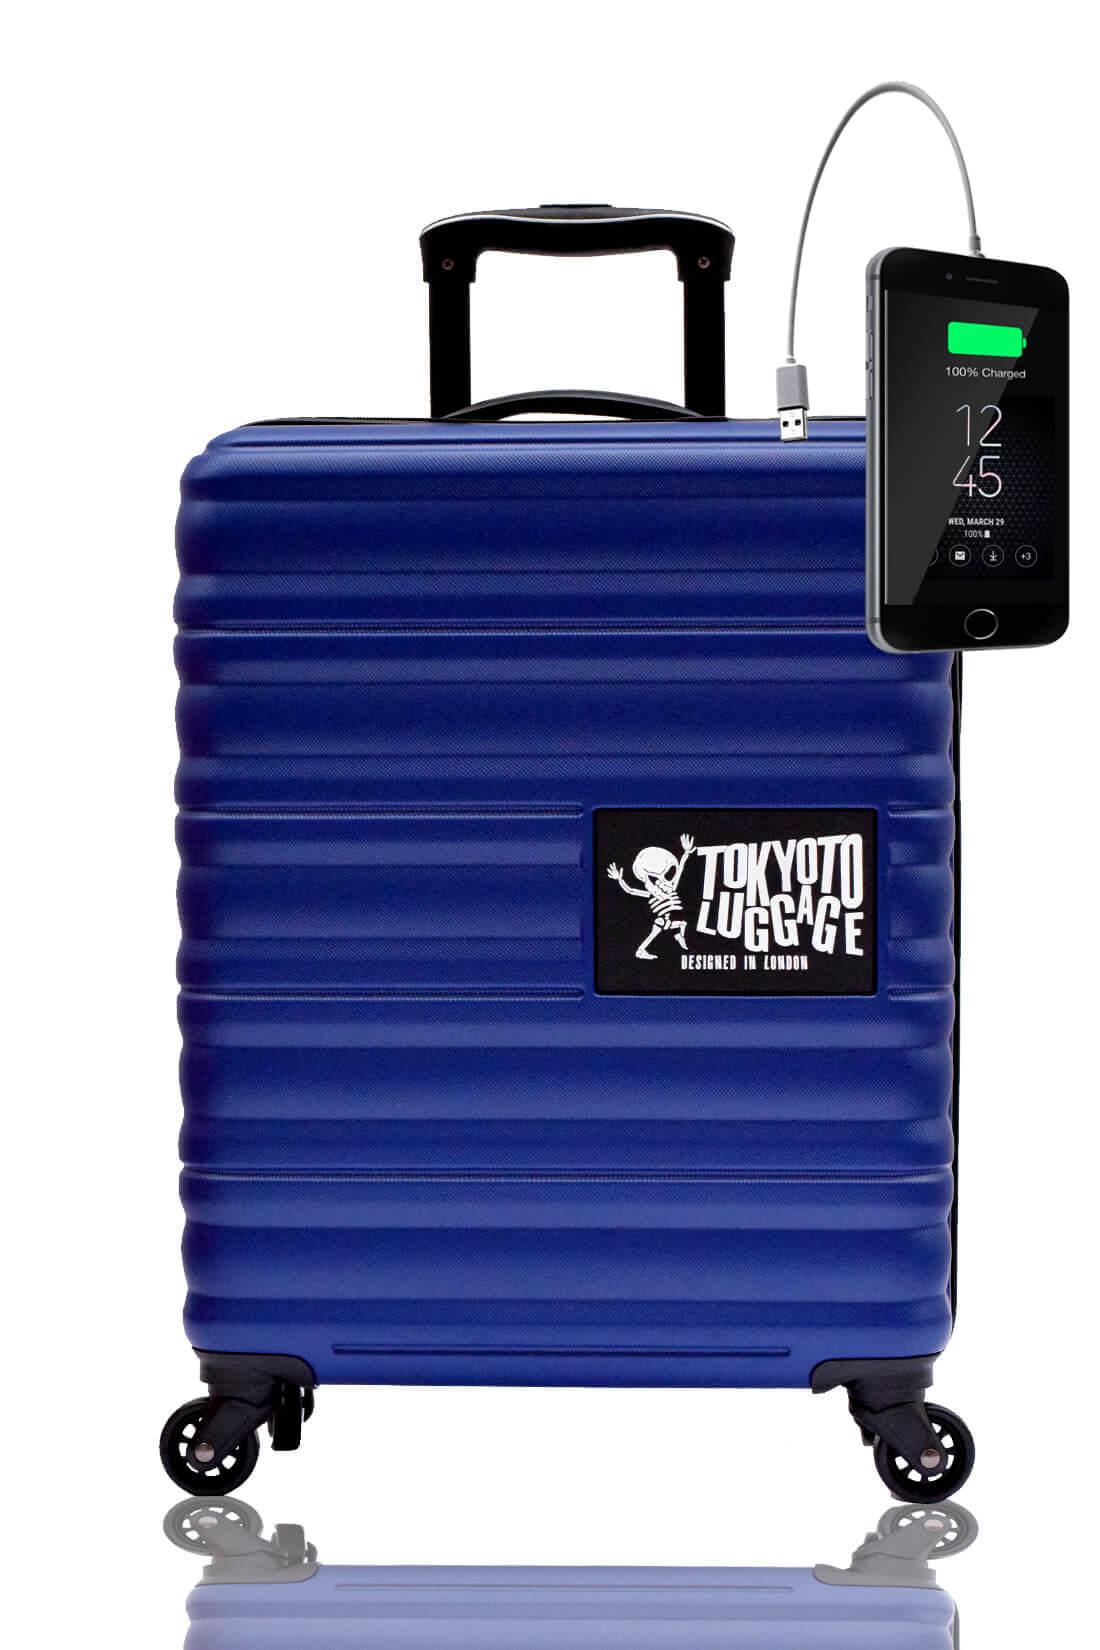 Unicolores Valise Online Cabine Trolley Enfant TOKYOTO LUGGAGE Modelle BLUE MARINE 2